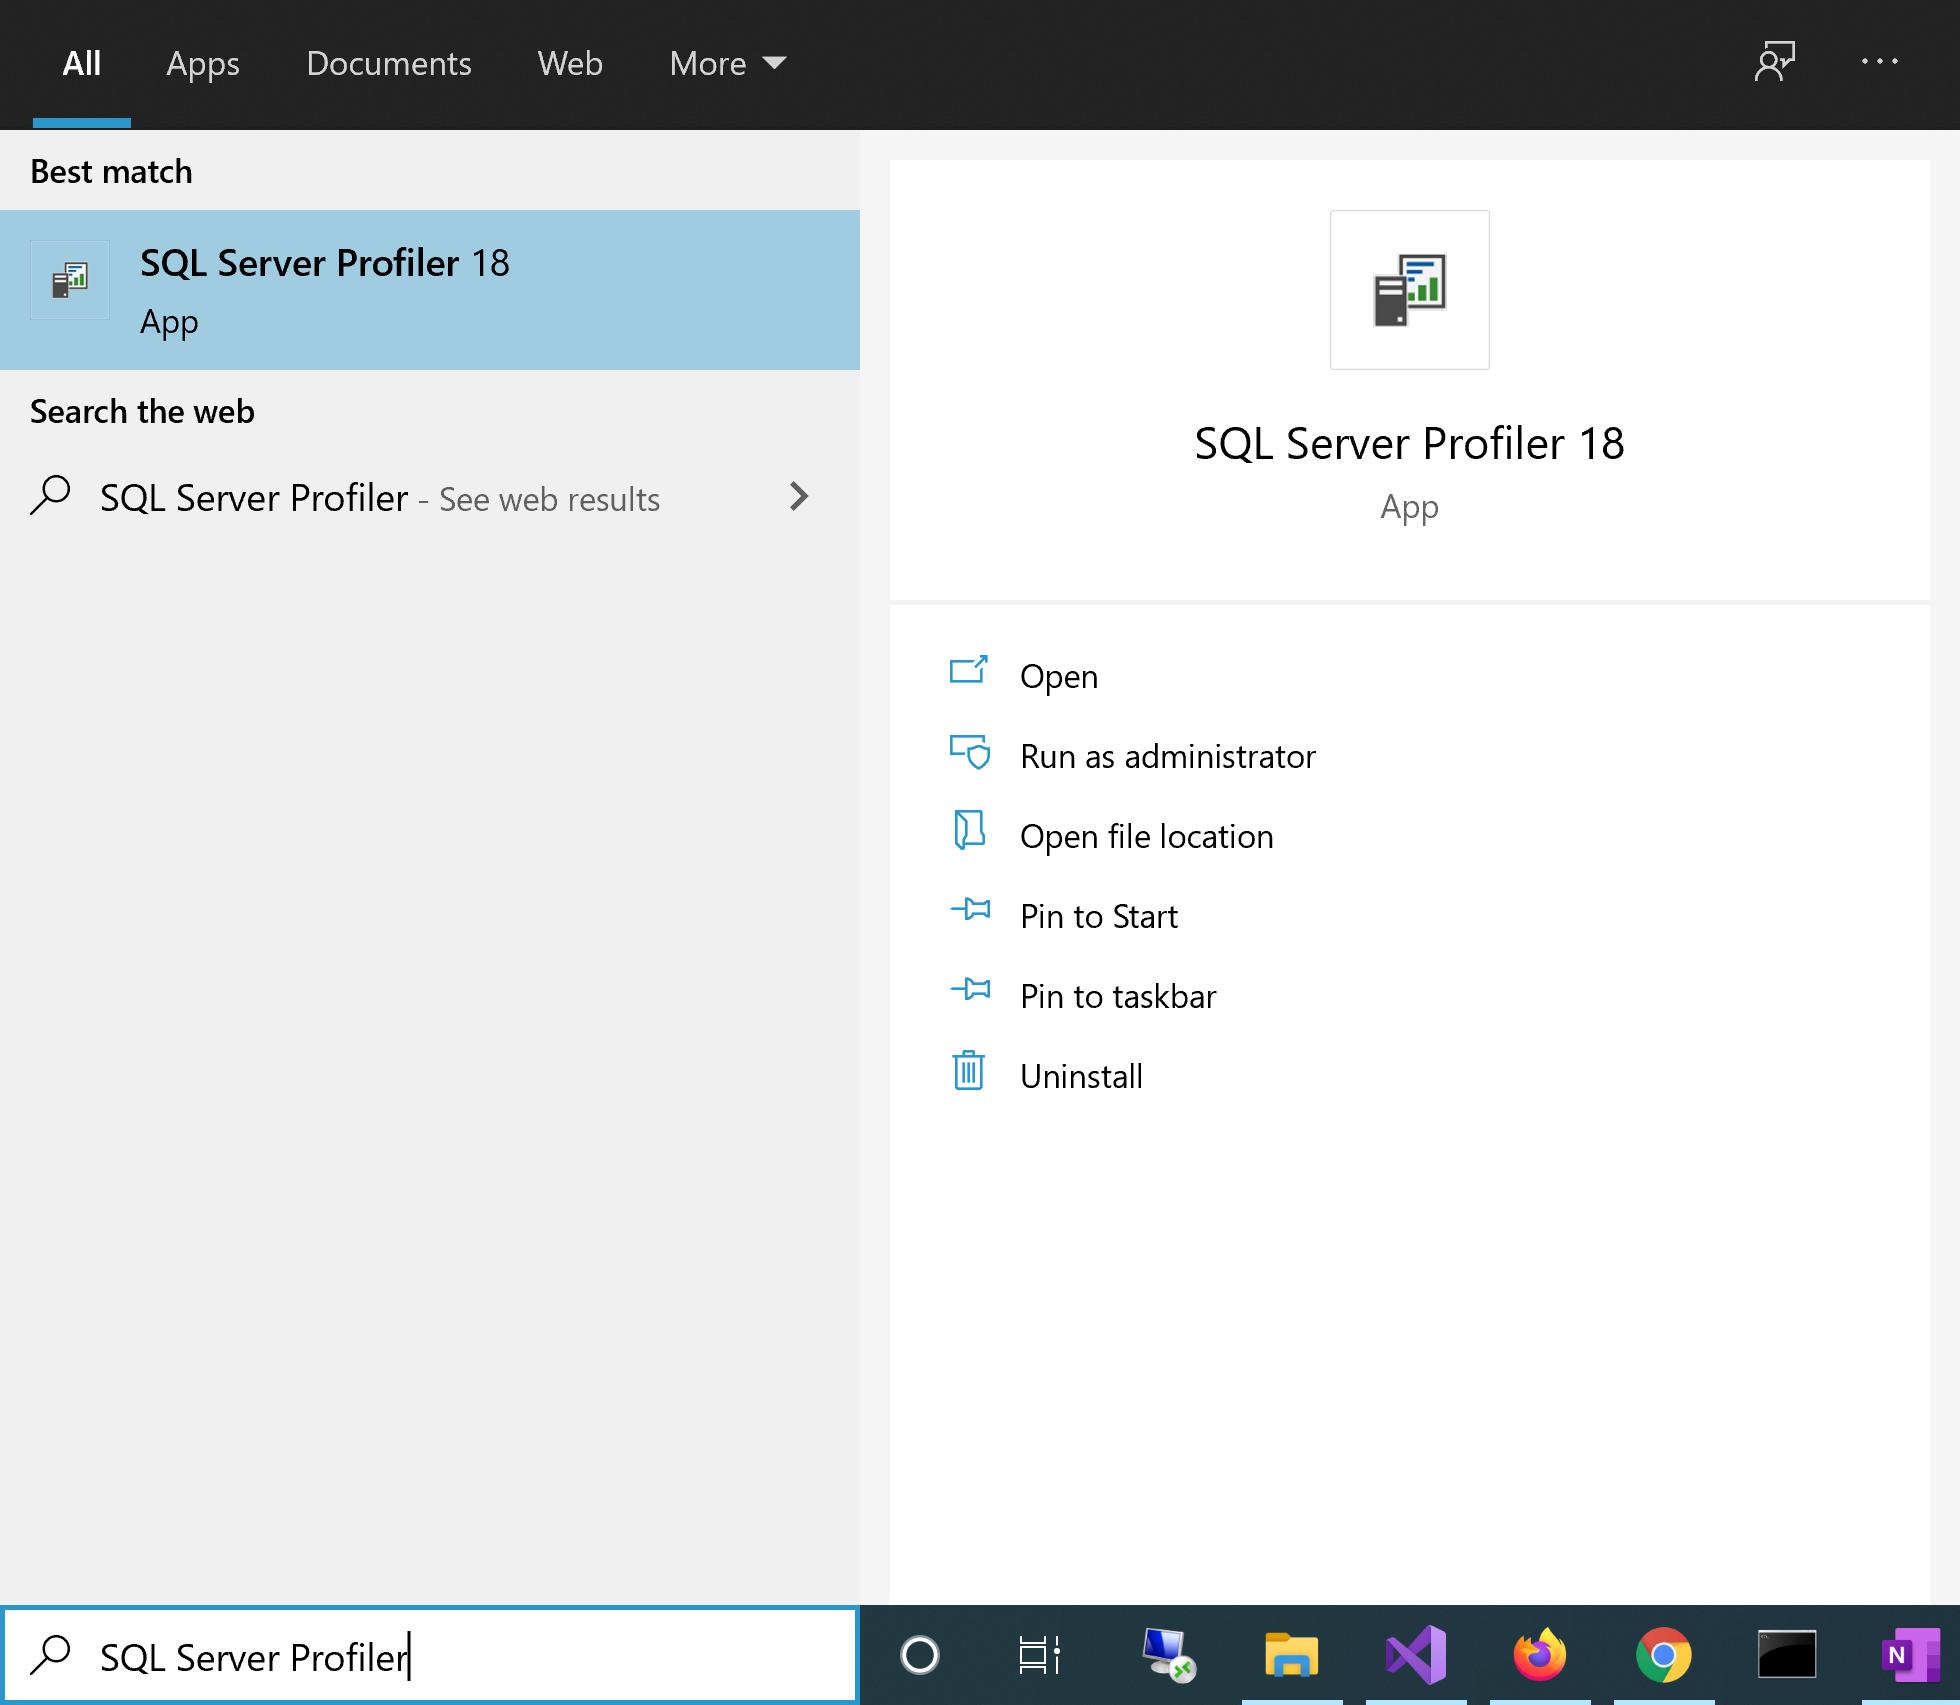 Launch SQL Server Profiler from Windows Explorer